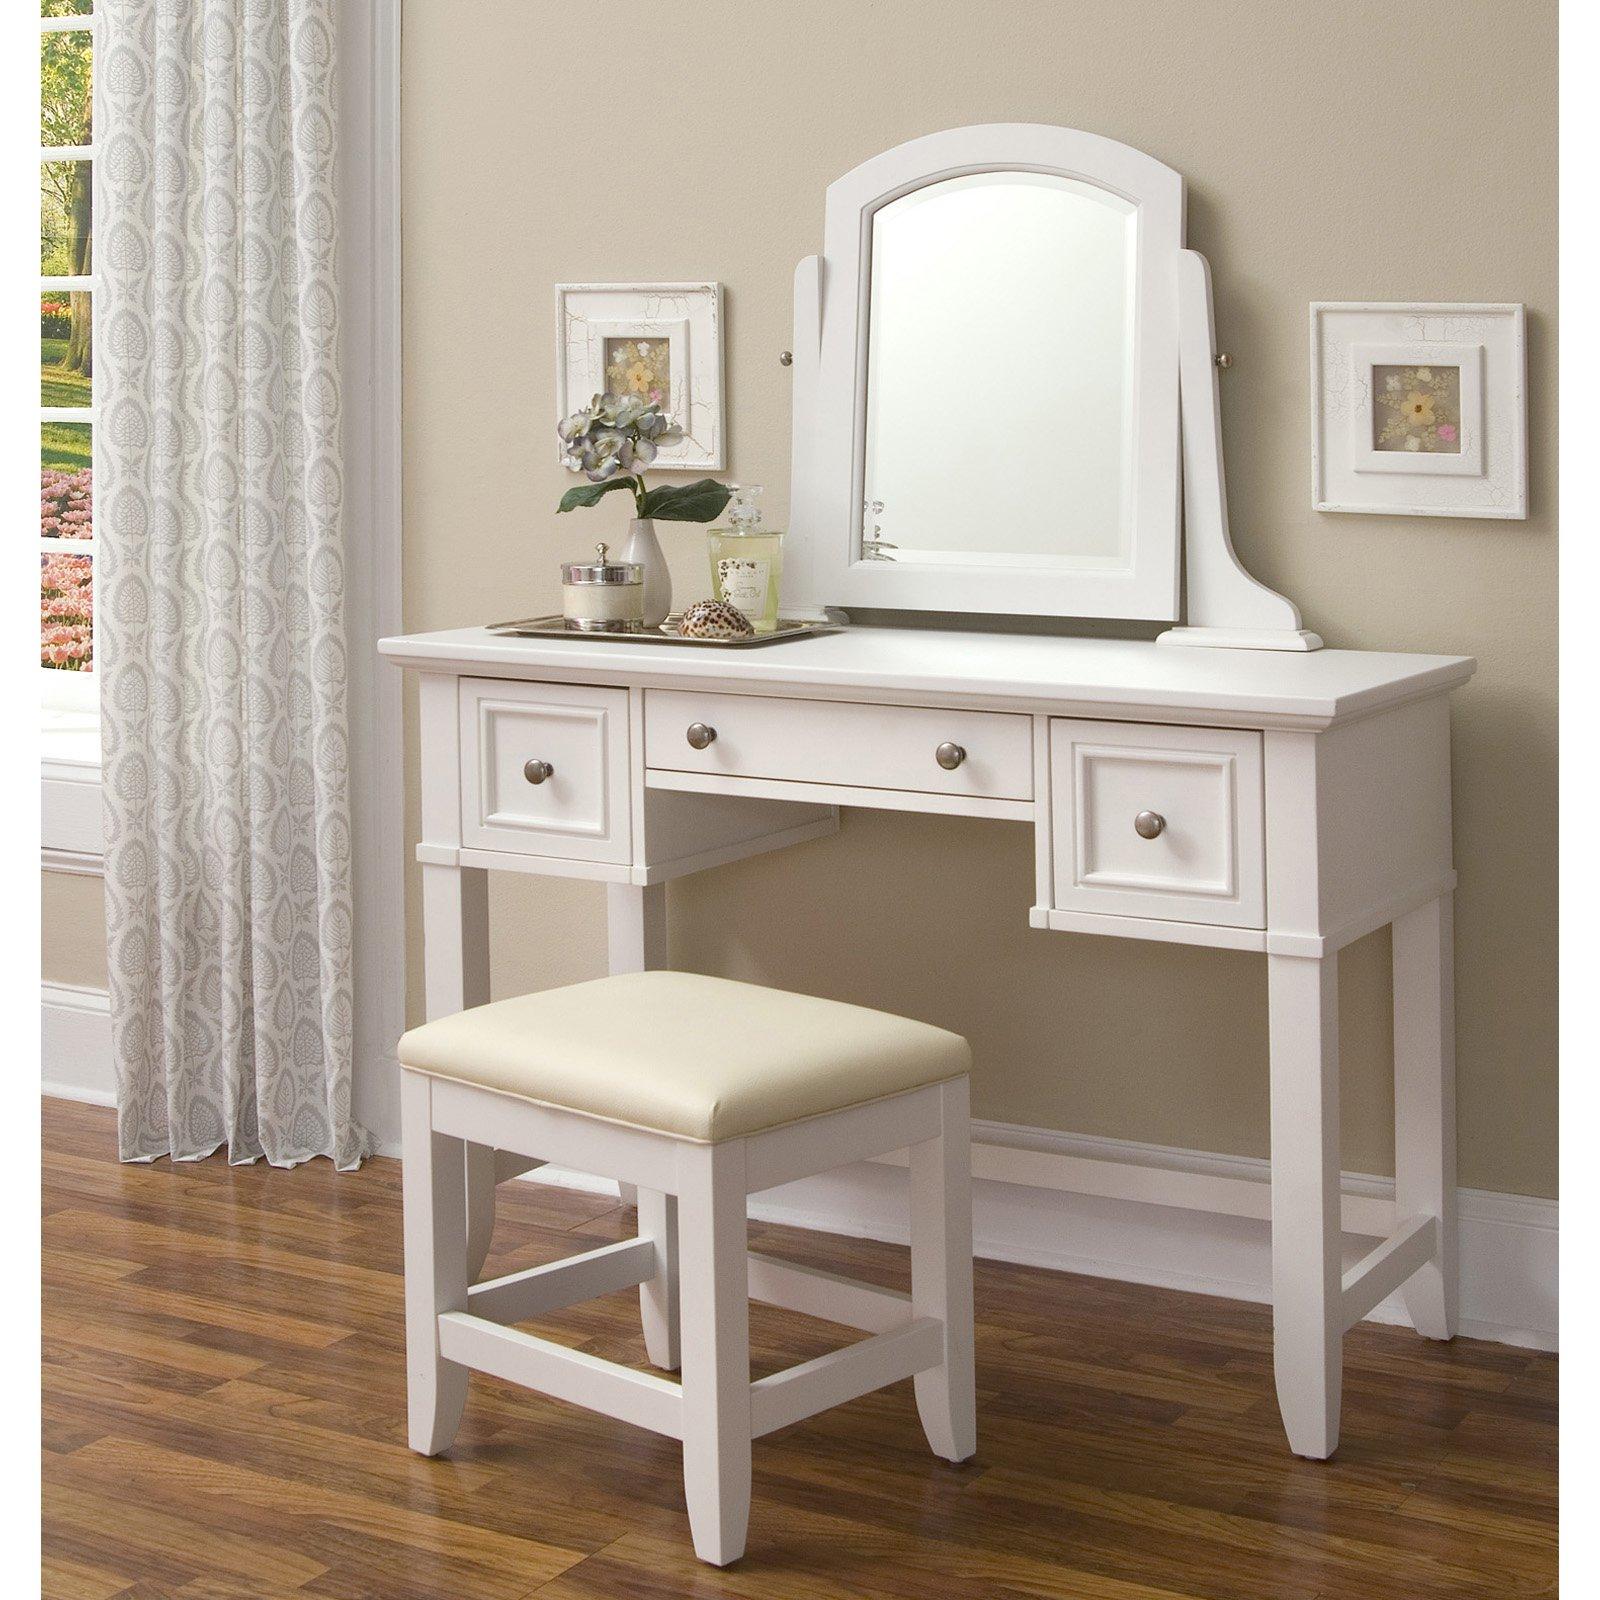 Home Styles Naples Bedroom Dressing Table - White |  Hayneedle OGIDNWA